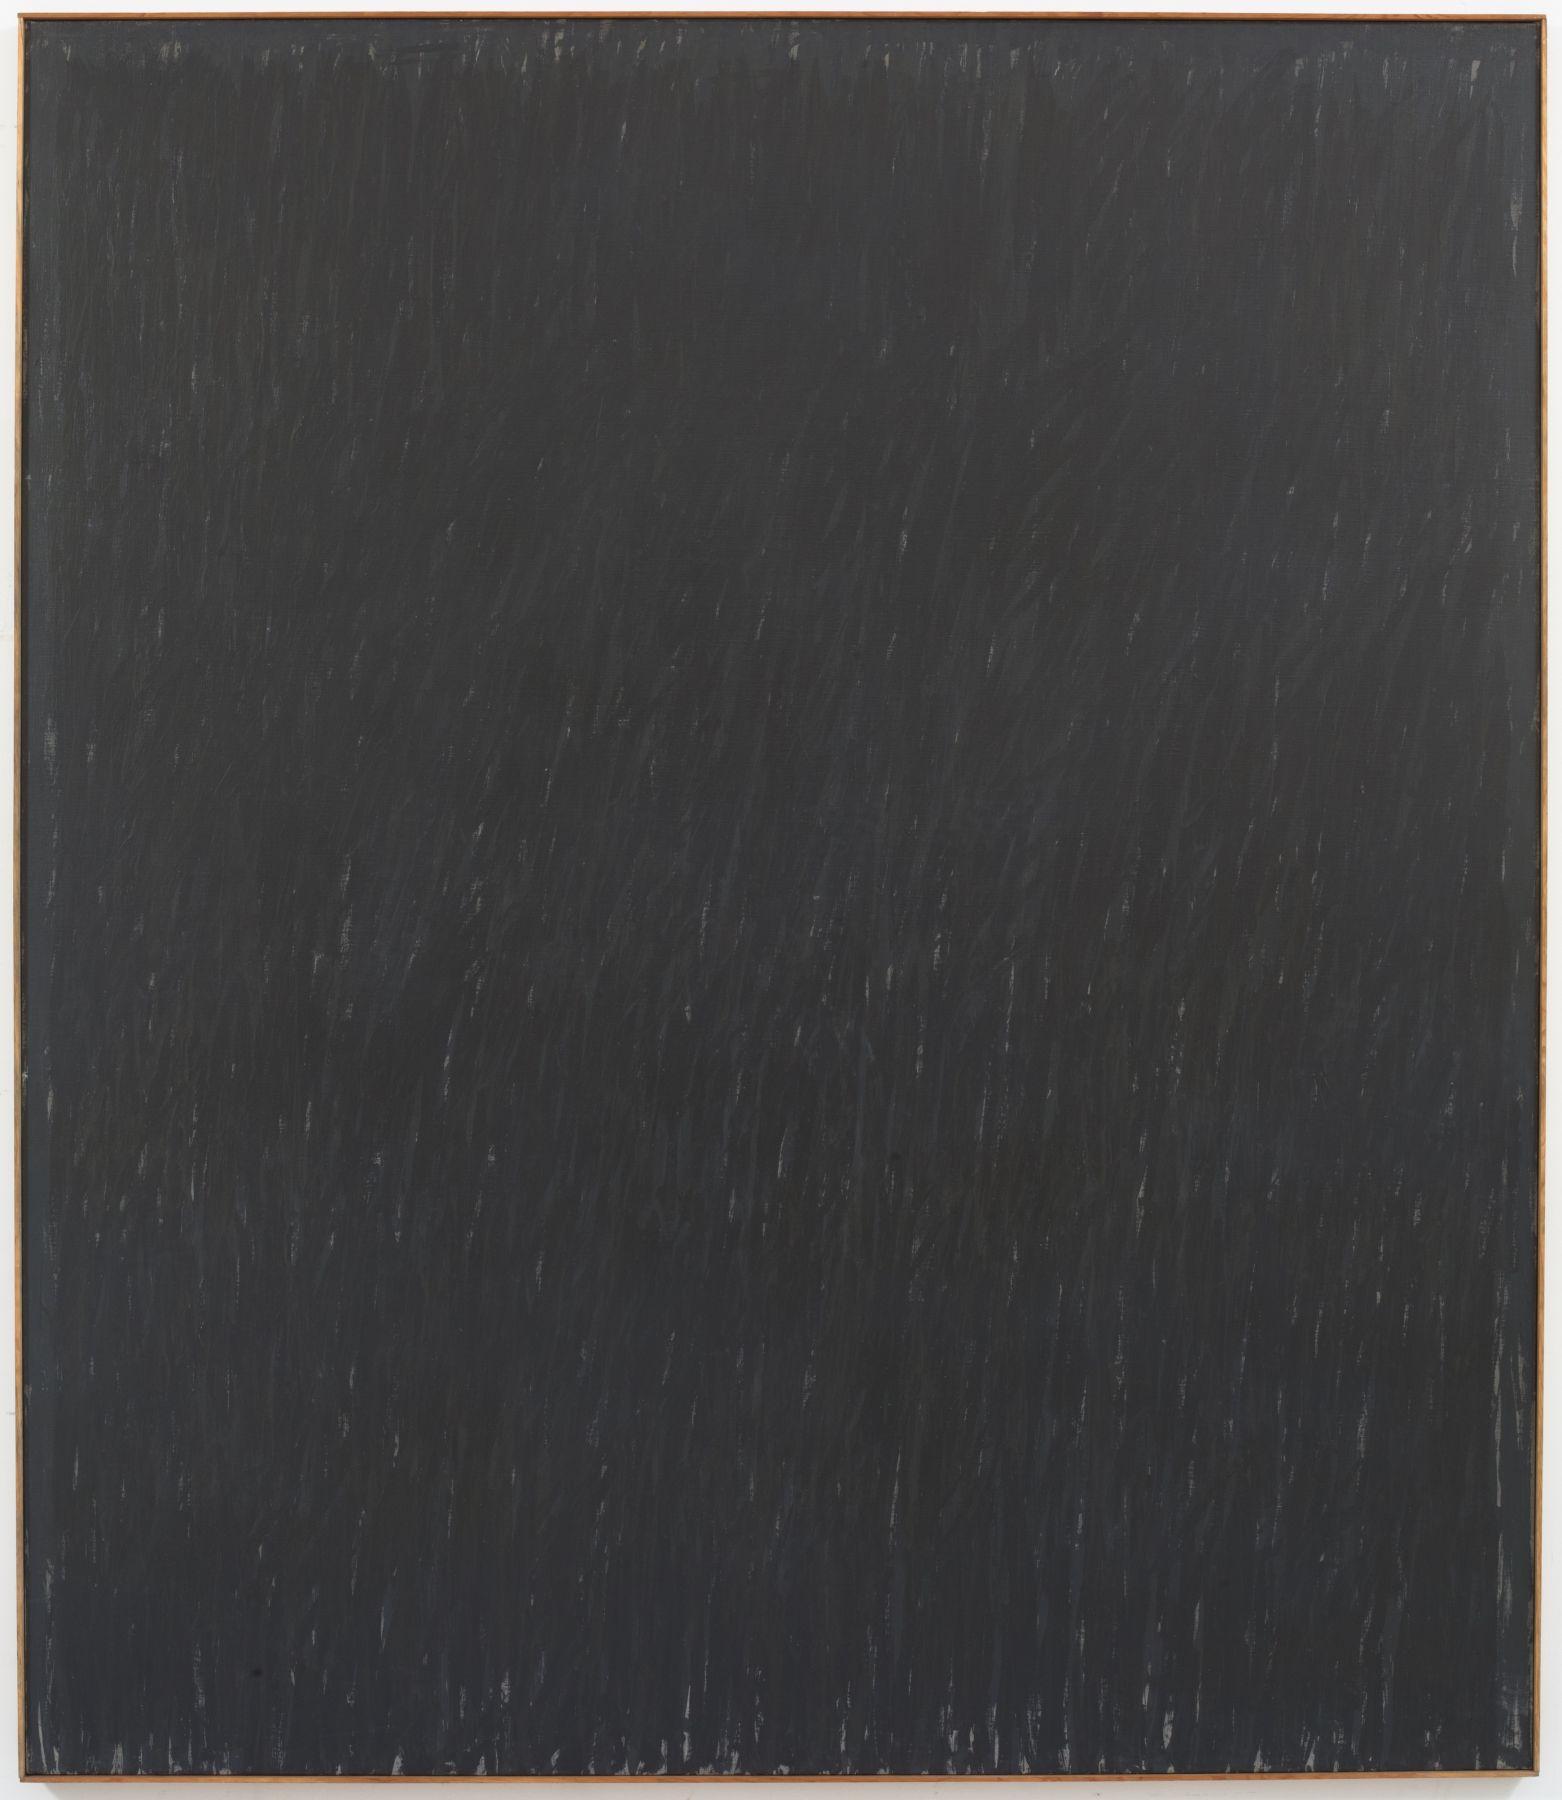 SSP #7, 1967, Oil on canvas